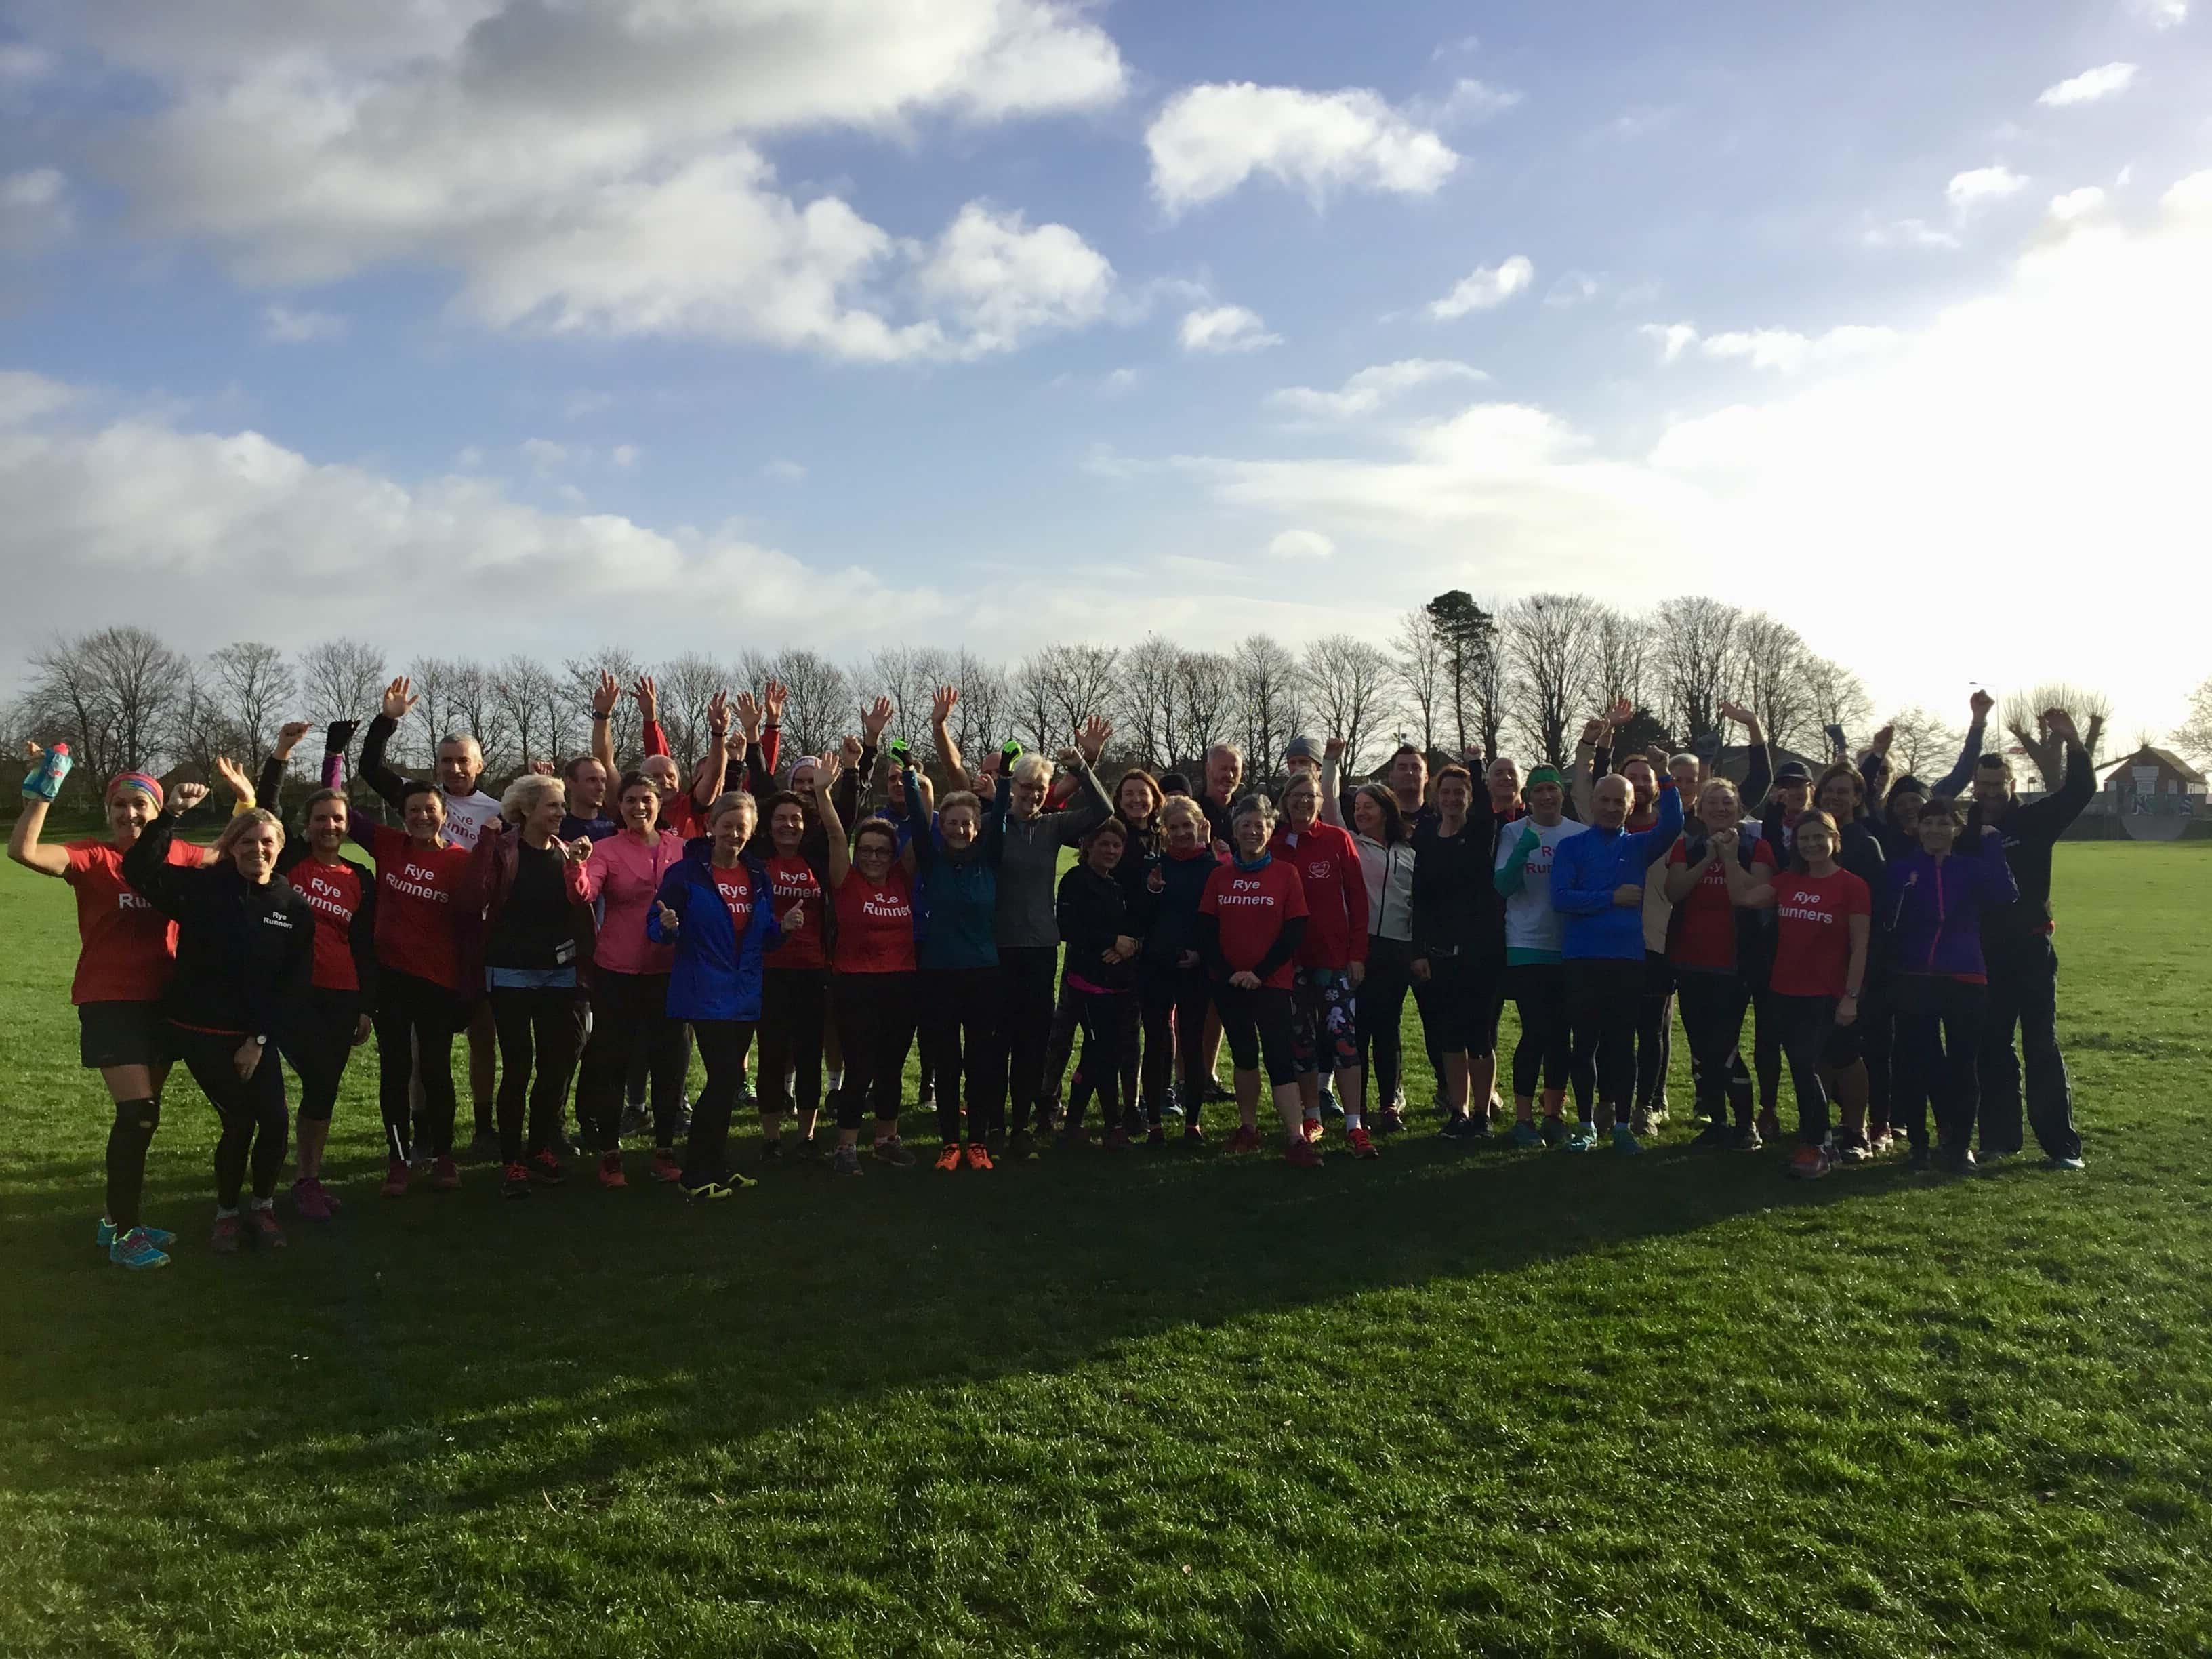 group shot of running group